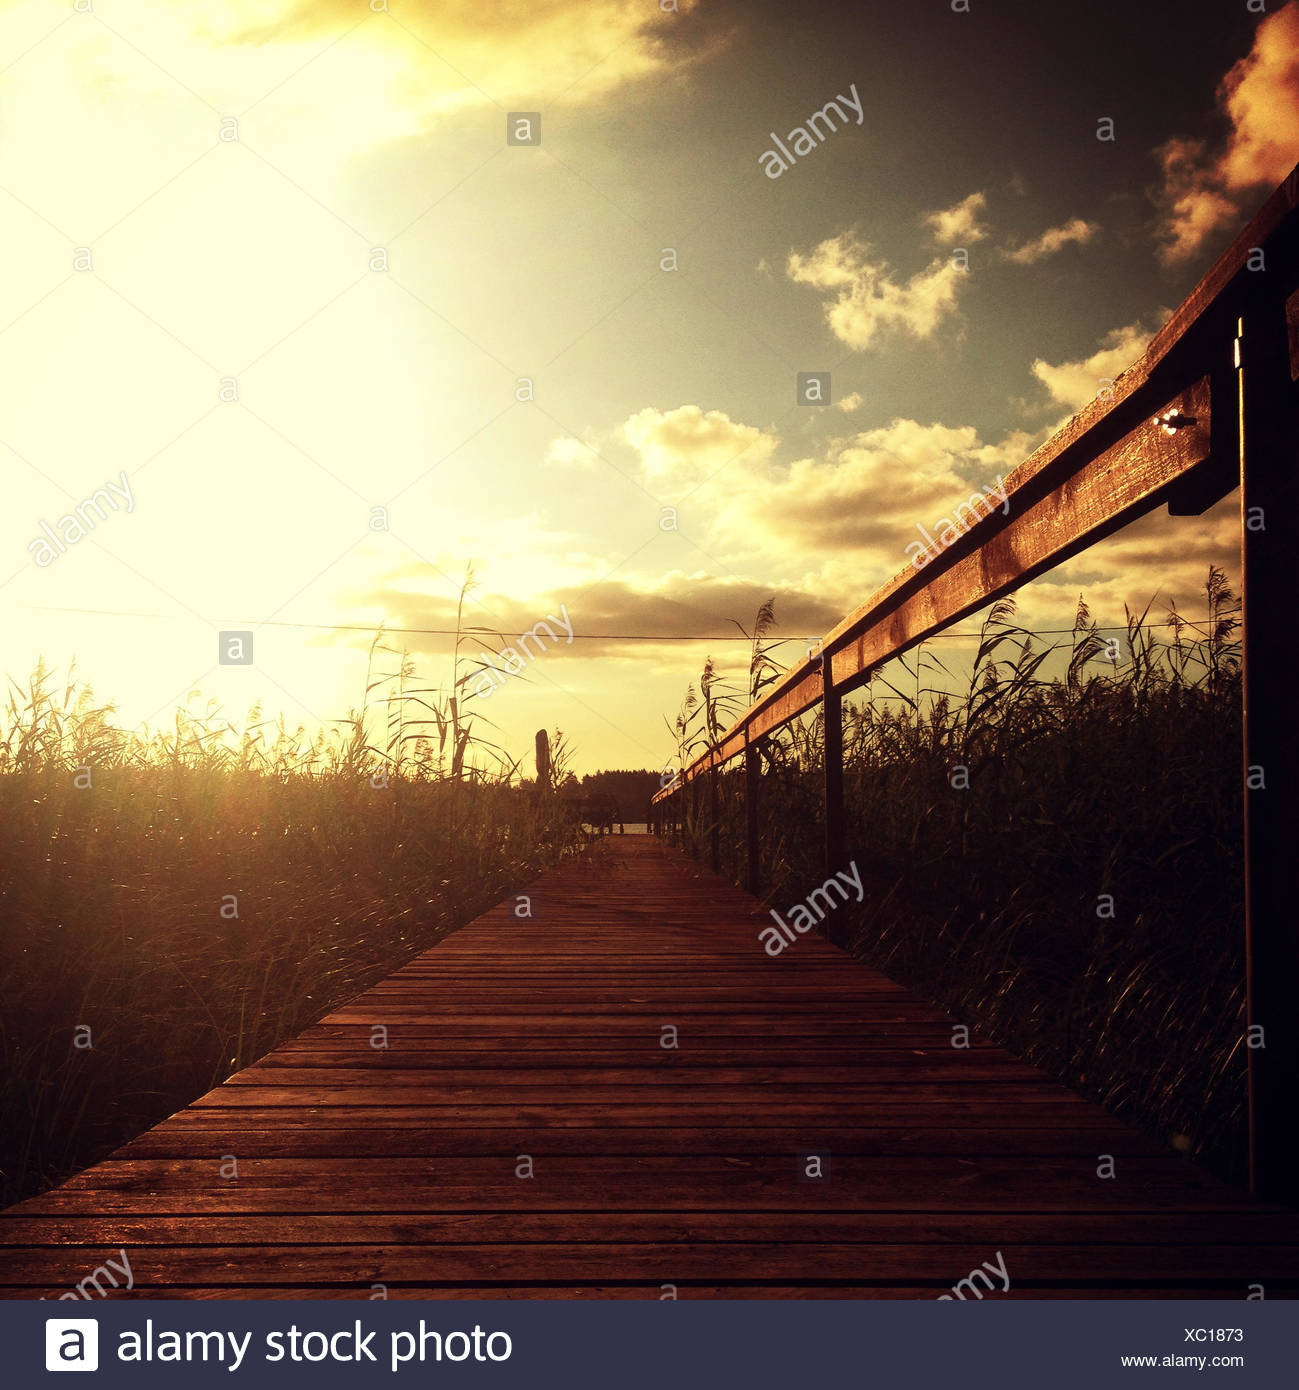 Wooden pier - Stock Image